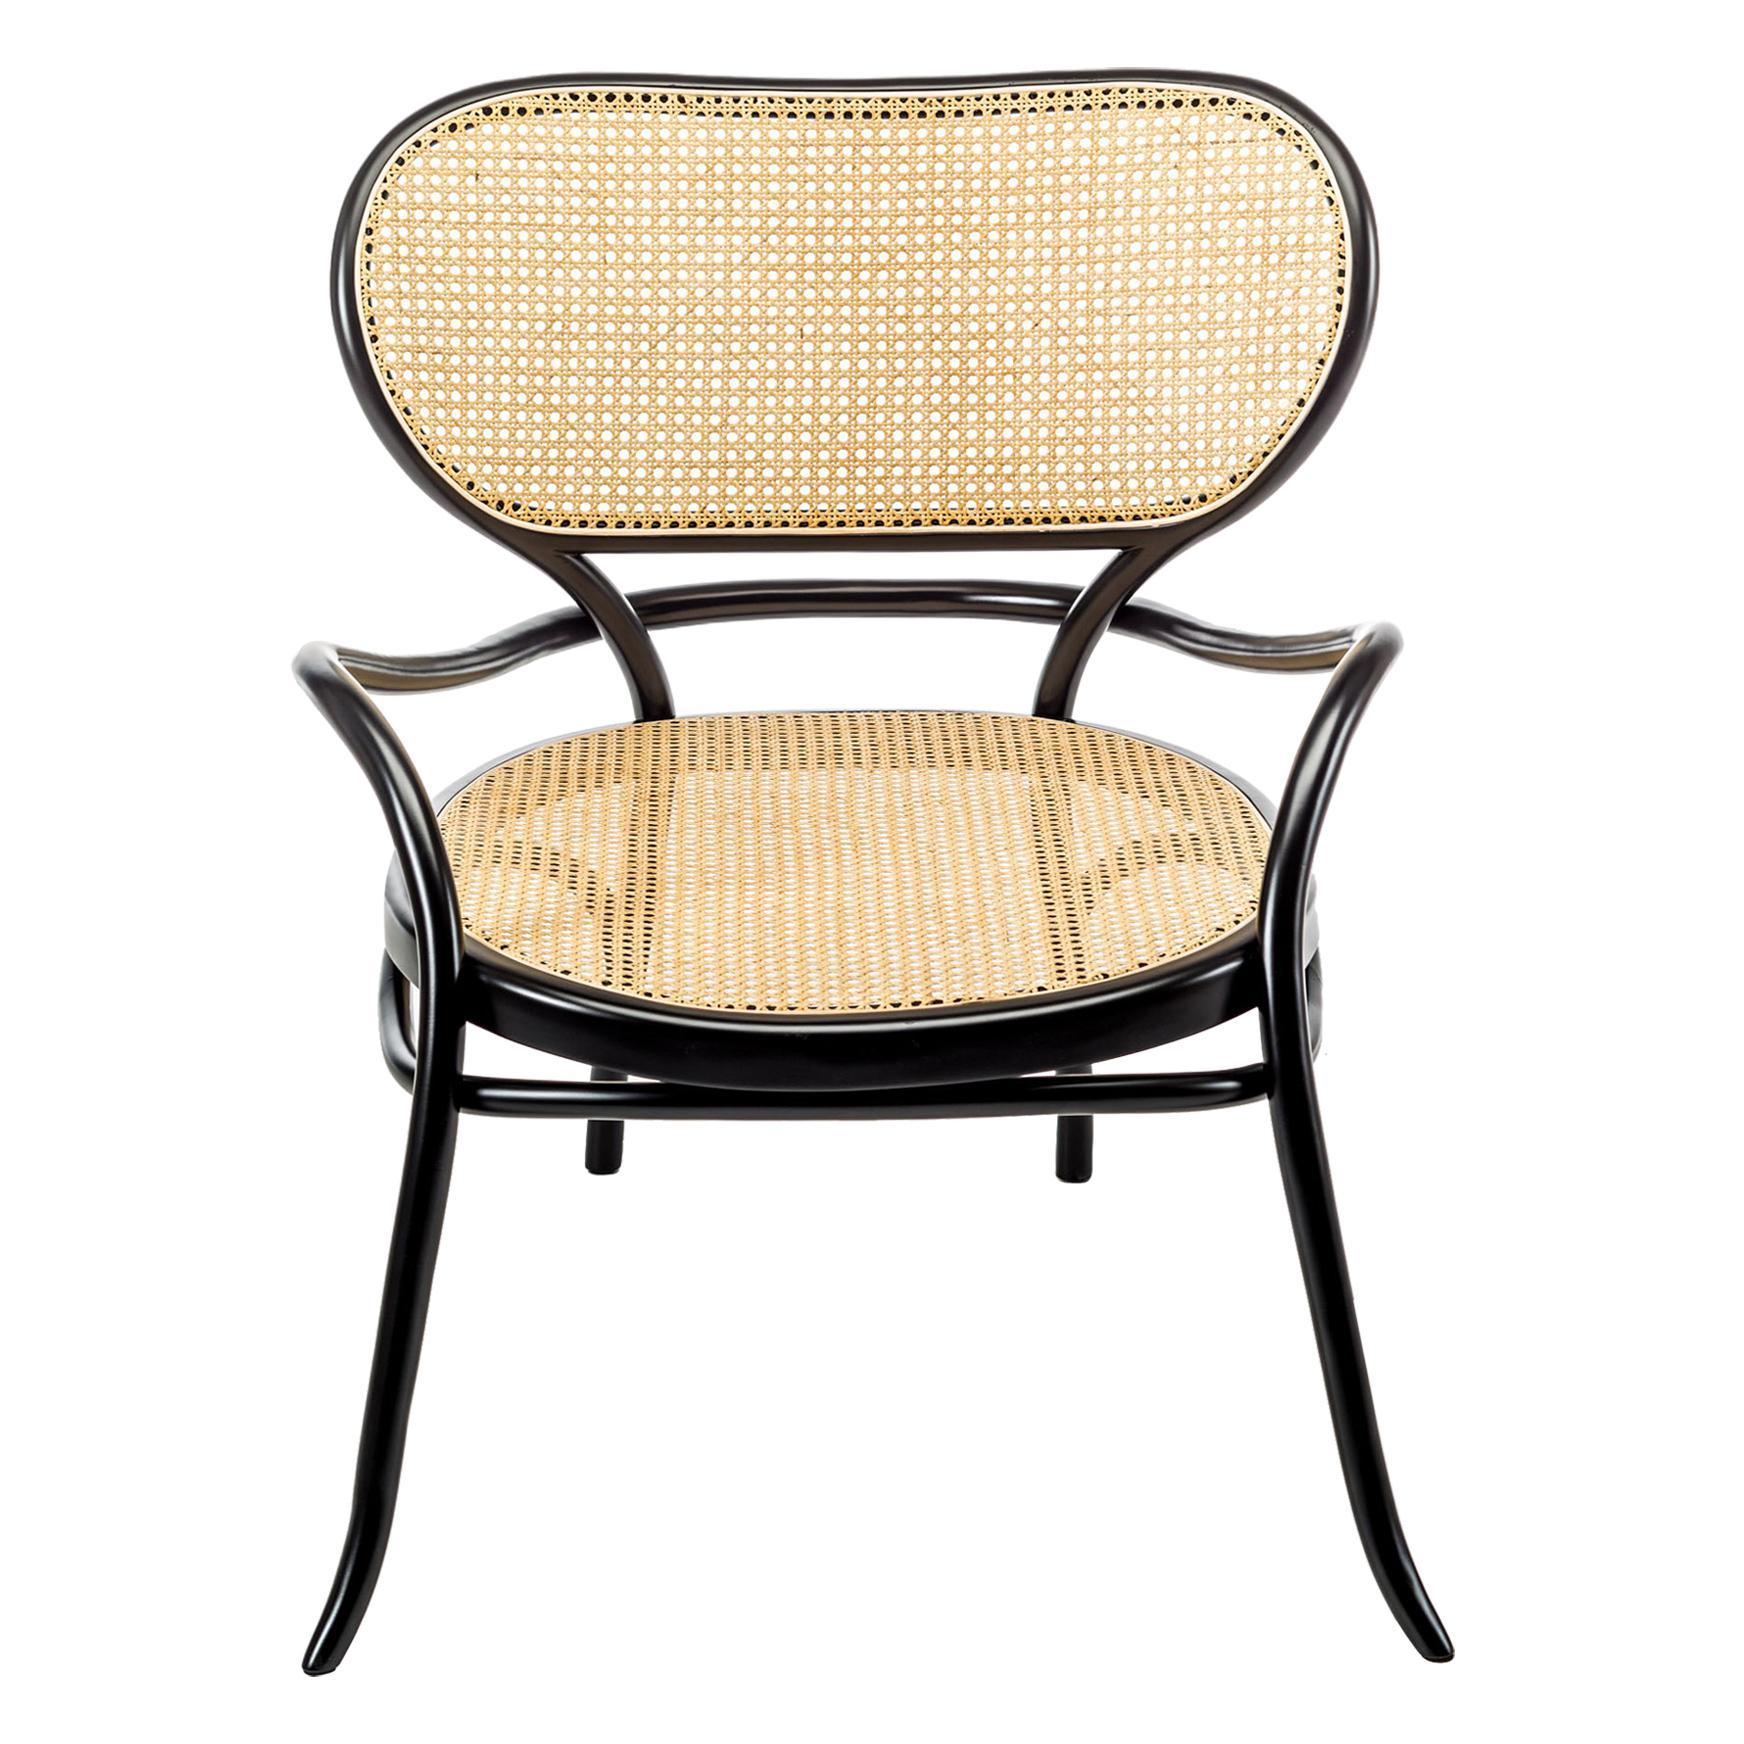 Gebrüder Thonet Vienna GmbH Lehnstuhl Lounge Chair in Black with Woven Cane Seat